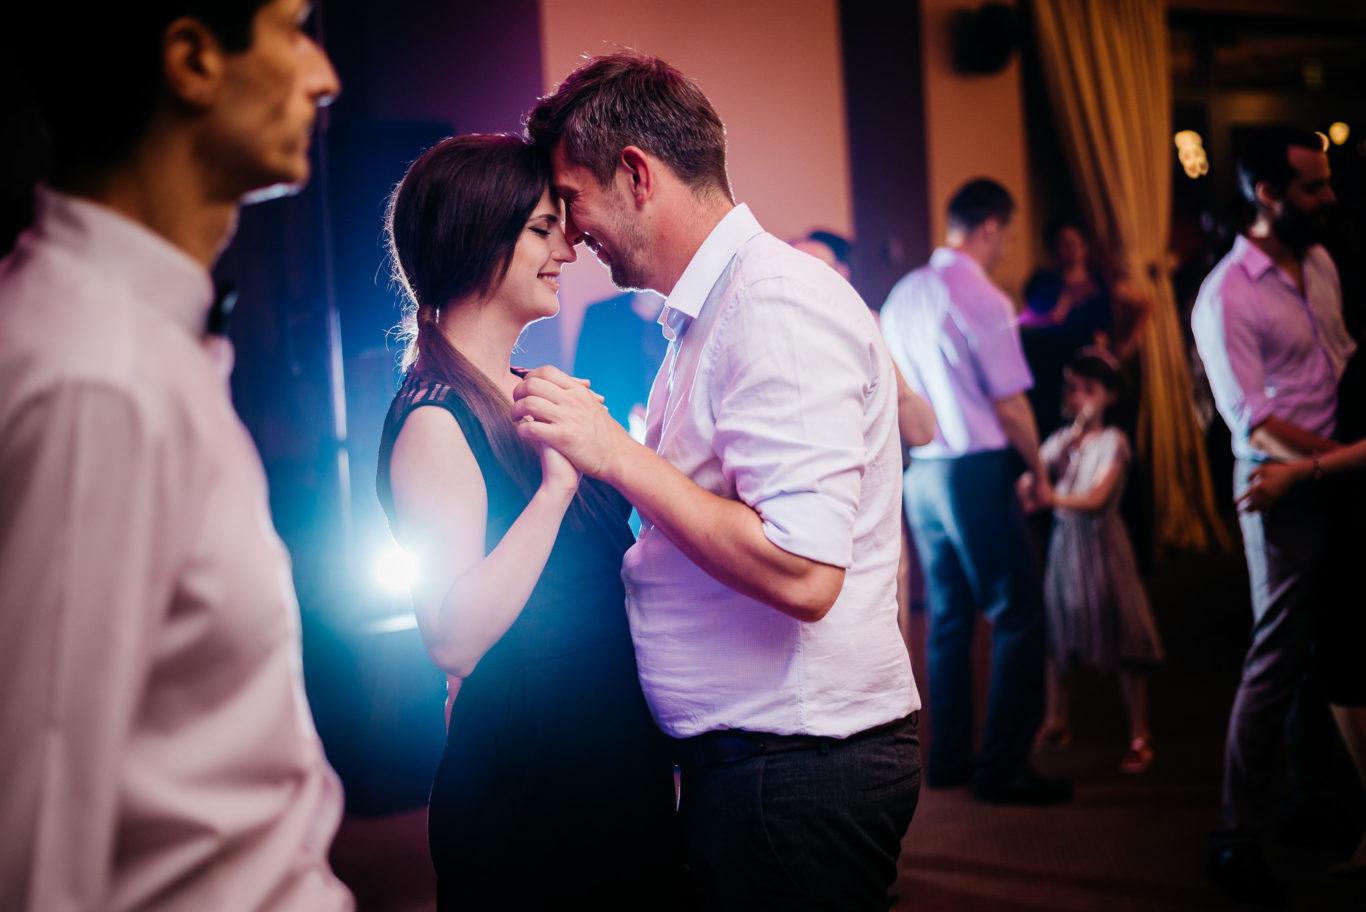 0888-Fotografie-nunta-Bucuresti-Oana-Catalin-fotograf-Ciprian-Dumitrescu-DSC_5908